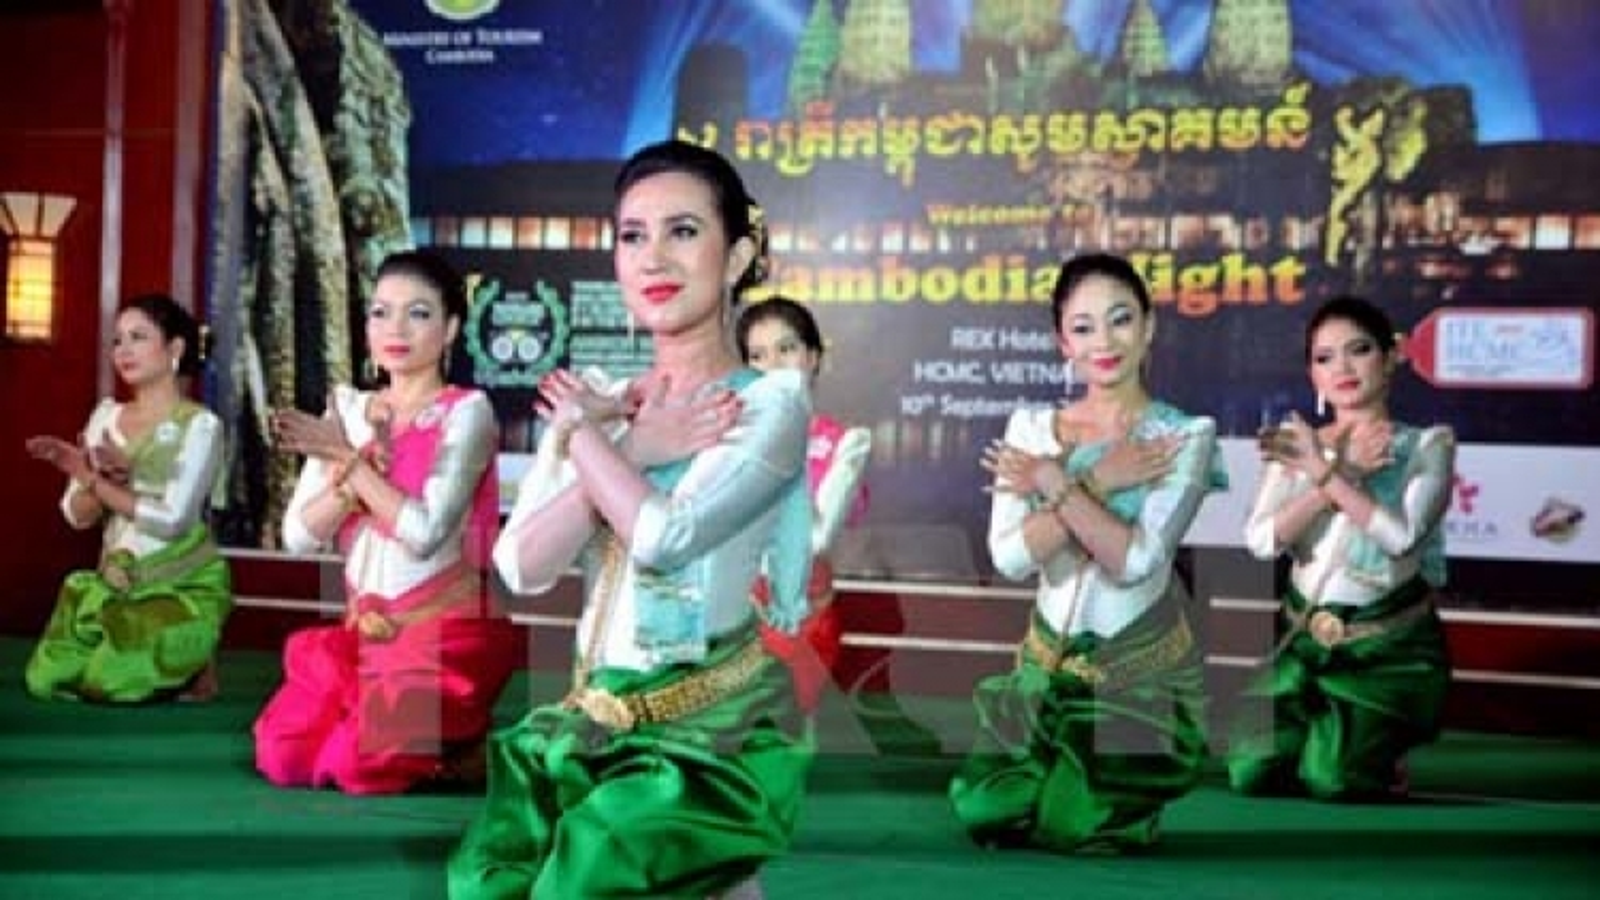 Vietnamese cities feature Cambodian culture